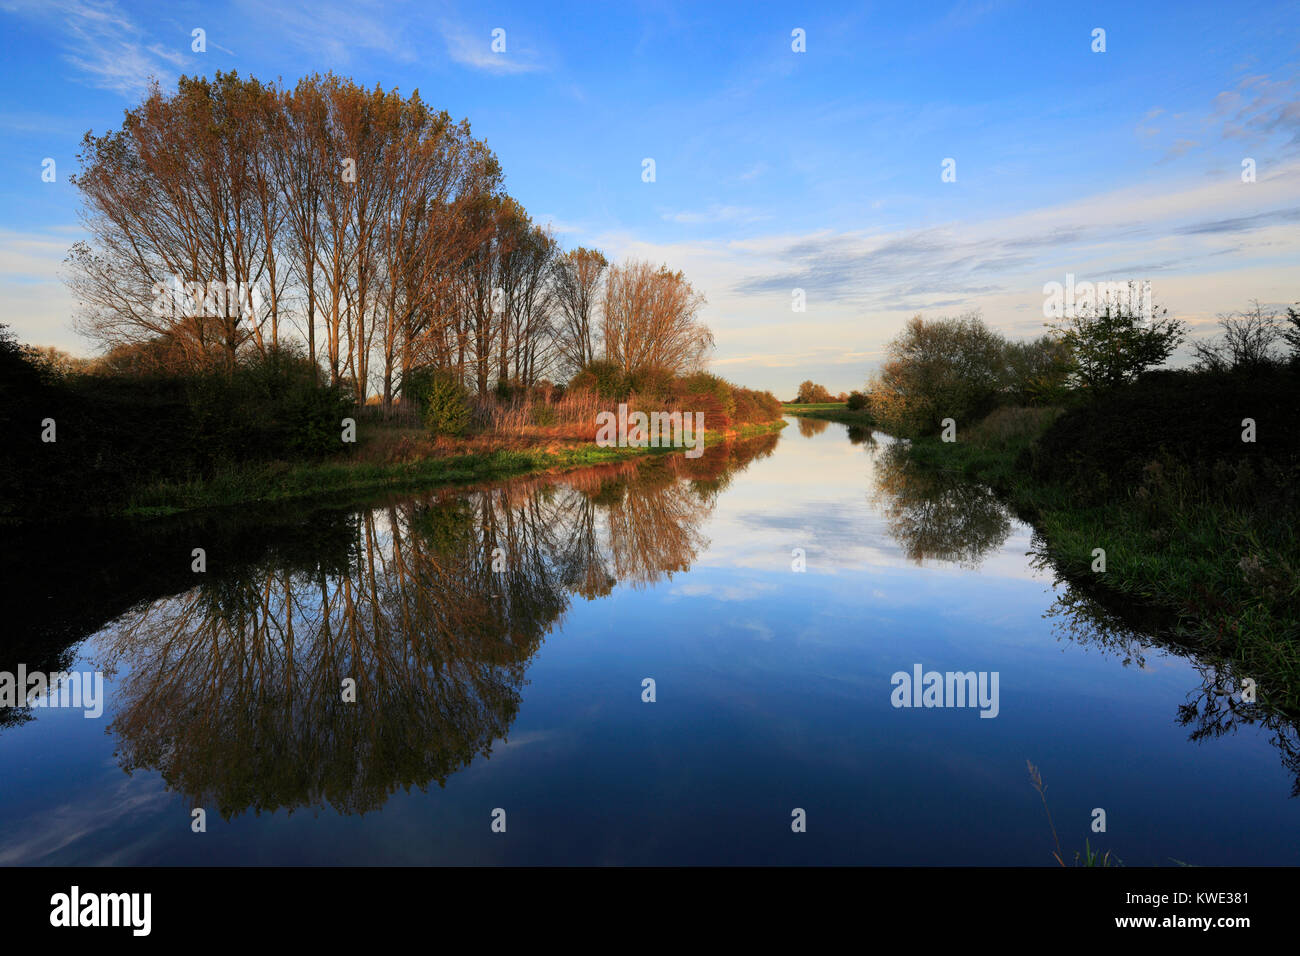 Autumn, River Welland, Peakirk village, Cambridgeshire, England, UK - Stock Image